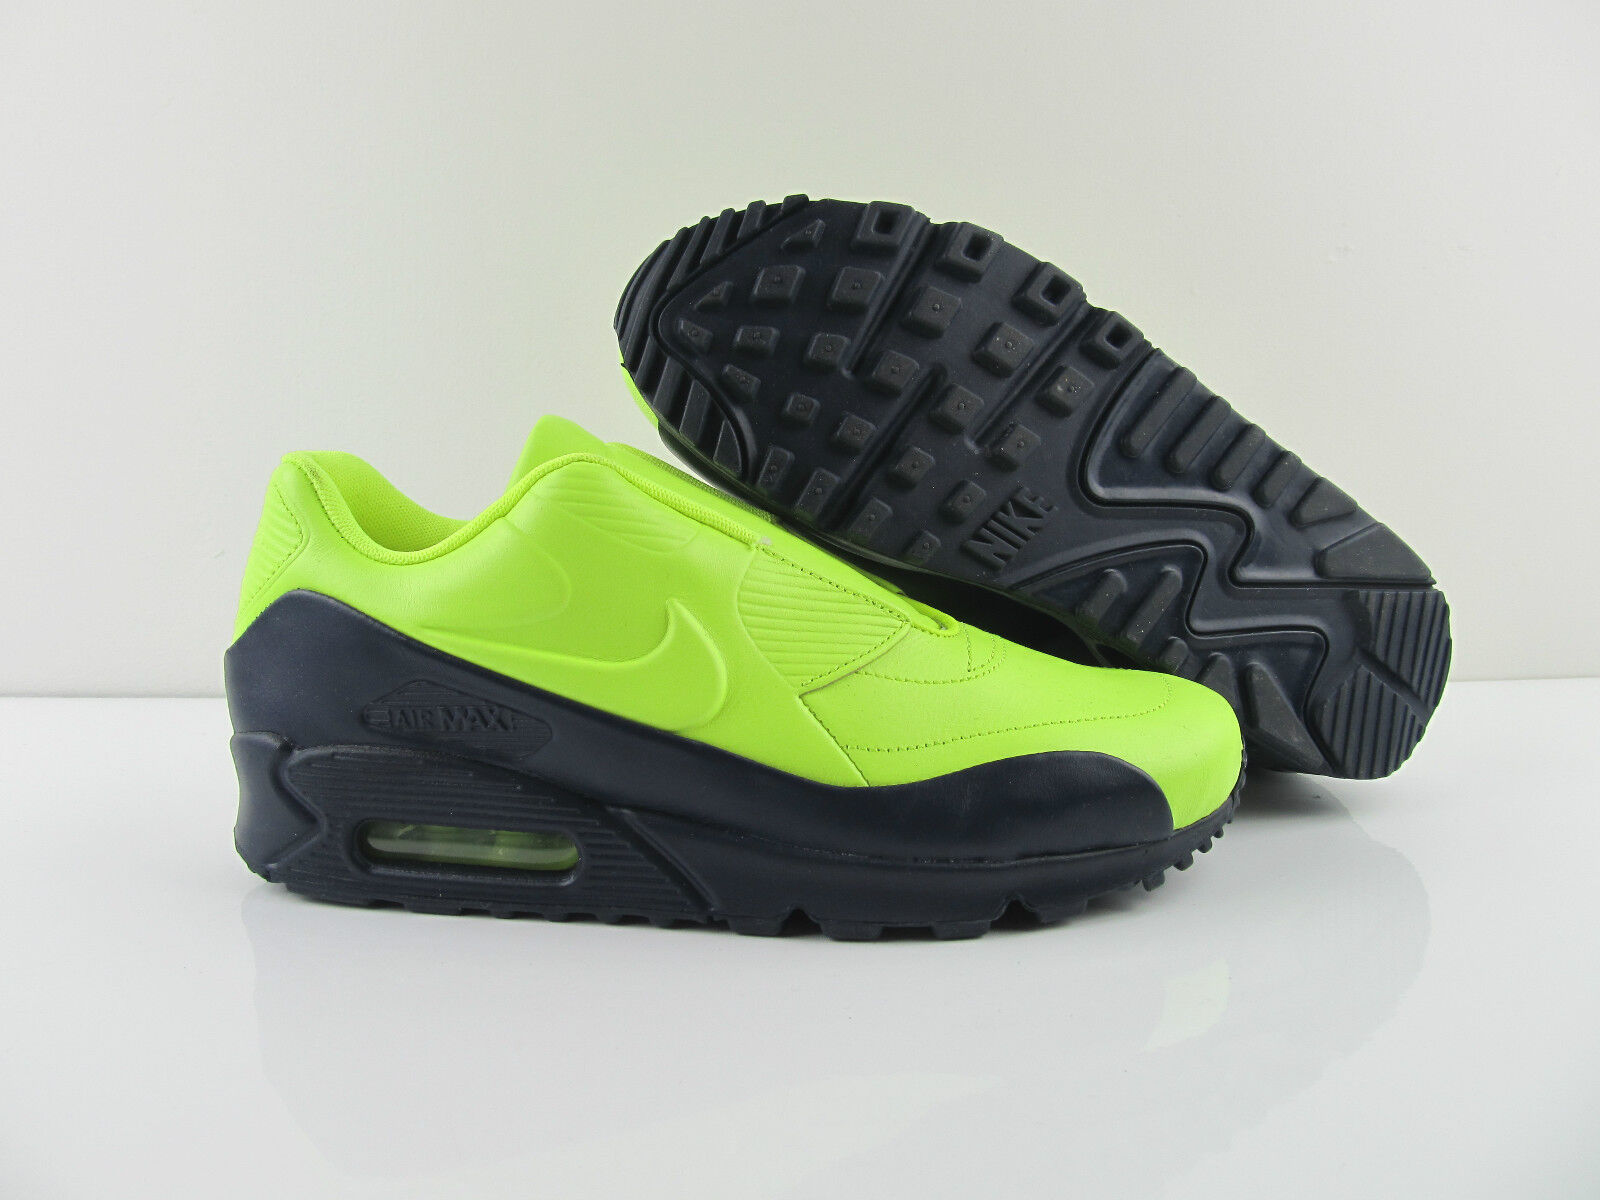 Nike Air Max 90 sp nikelab sacai obsidiana us_9 Azul voltios Neon cortos us_9 obsidiana 6b37de